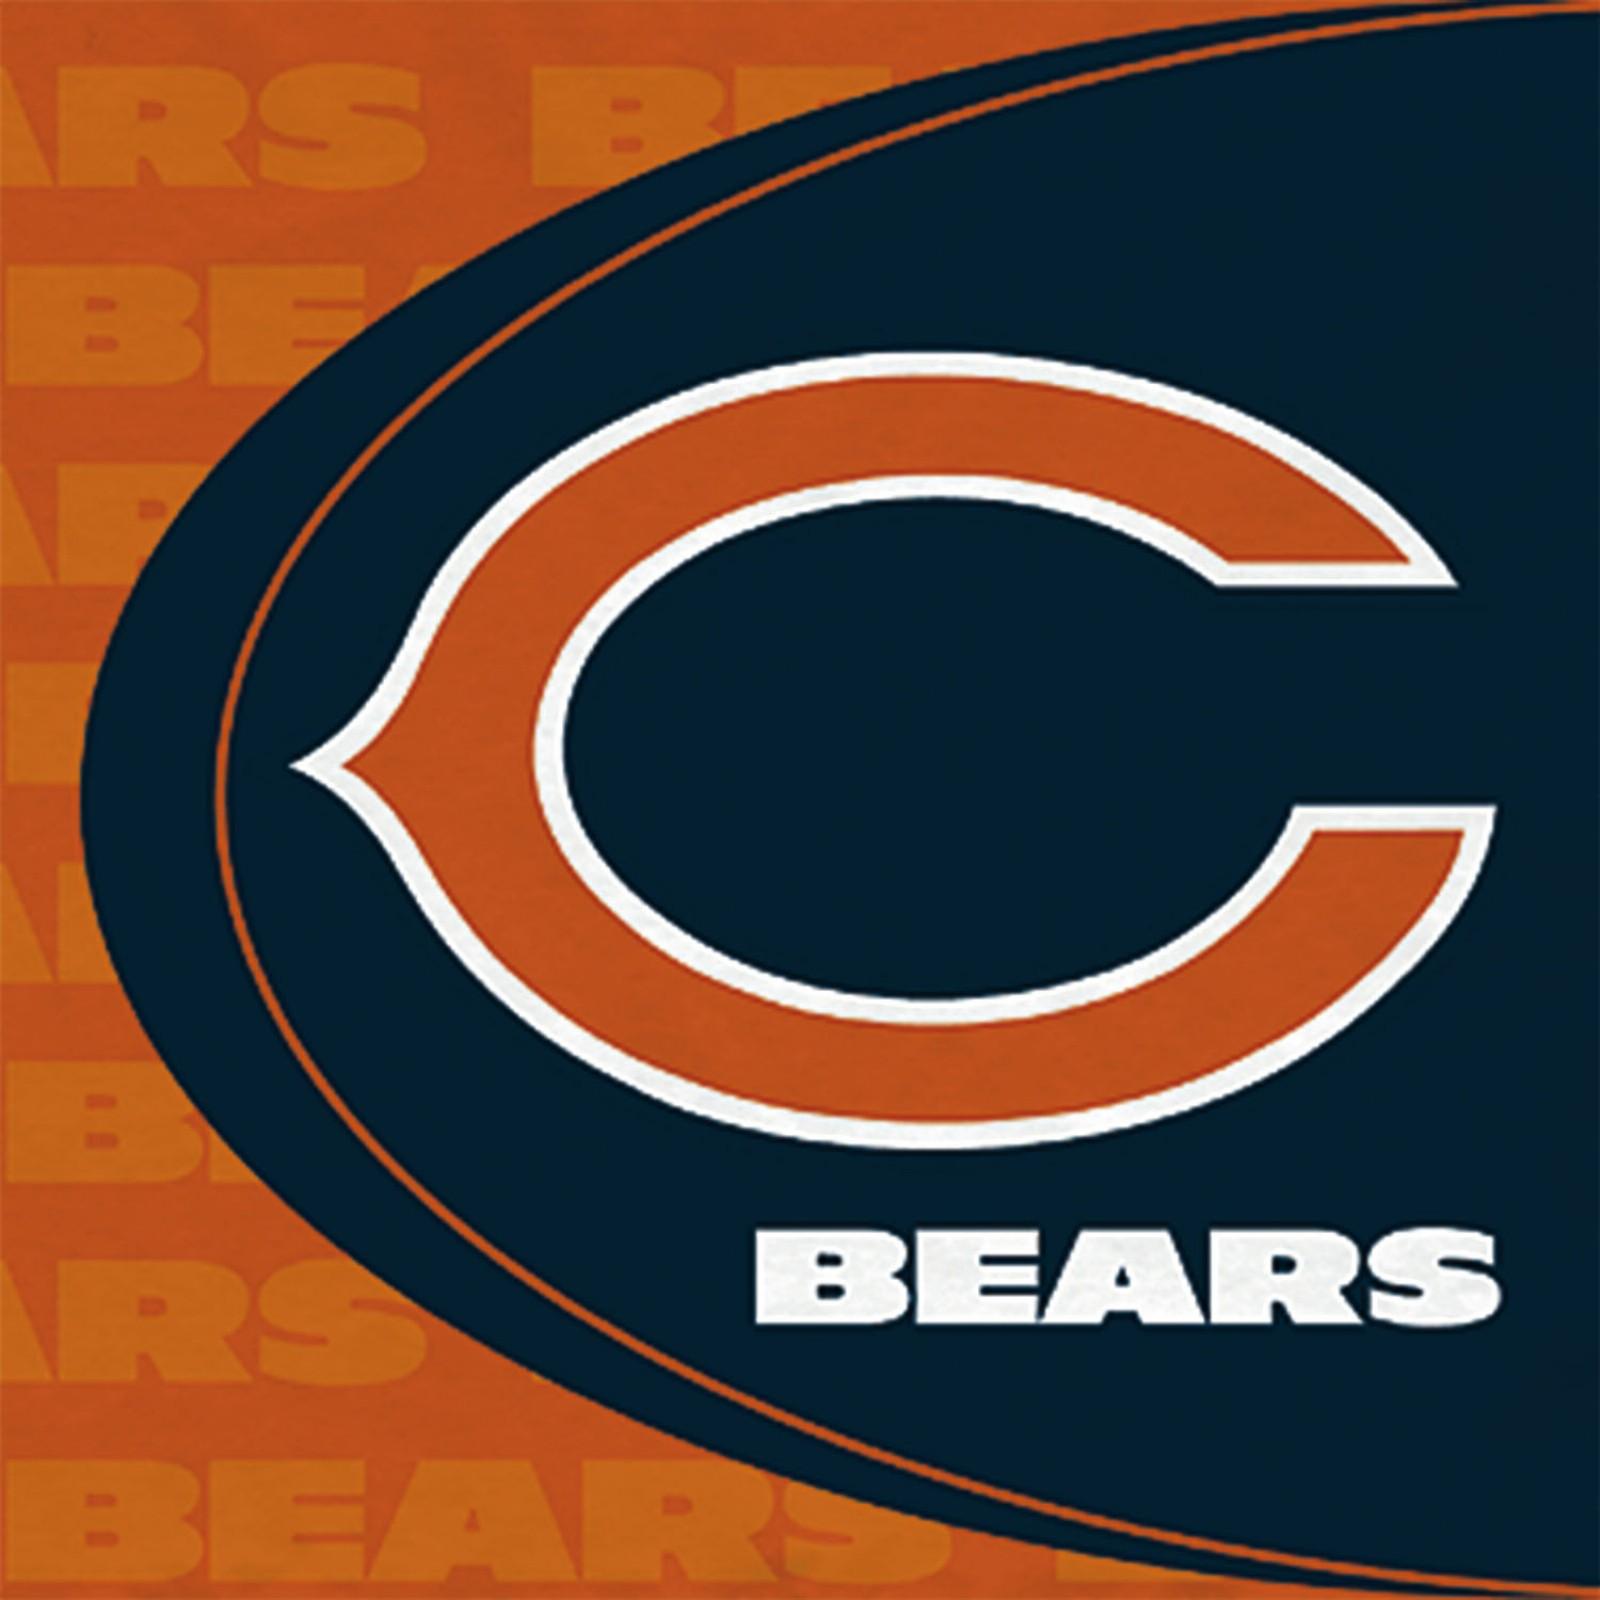 Chicago Bears wallpaper background